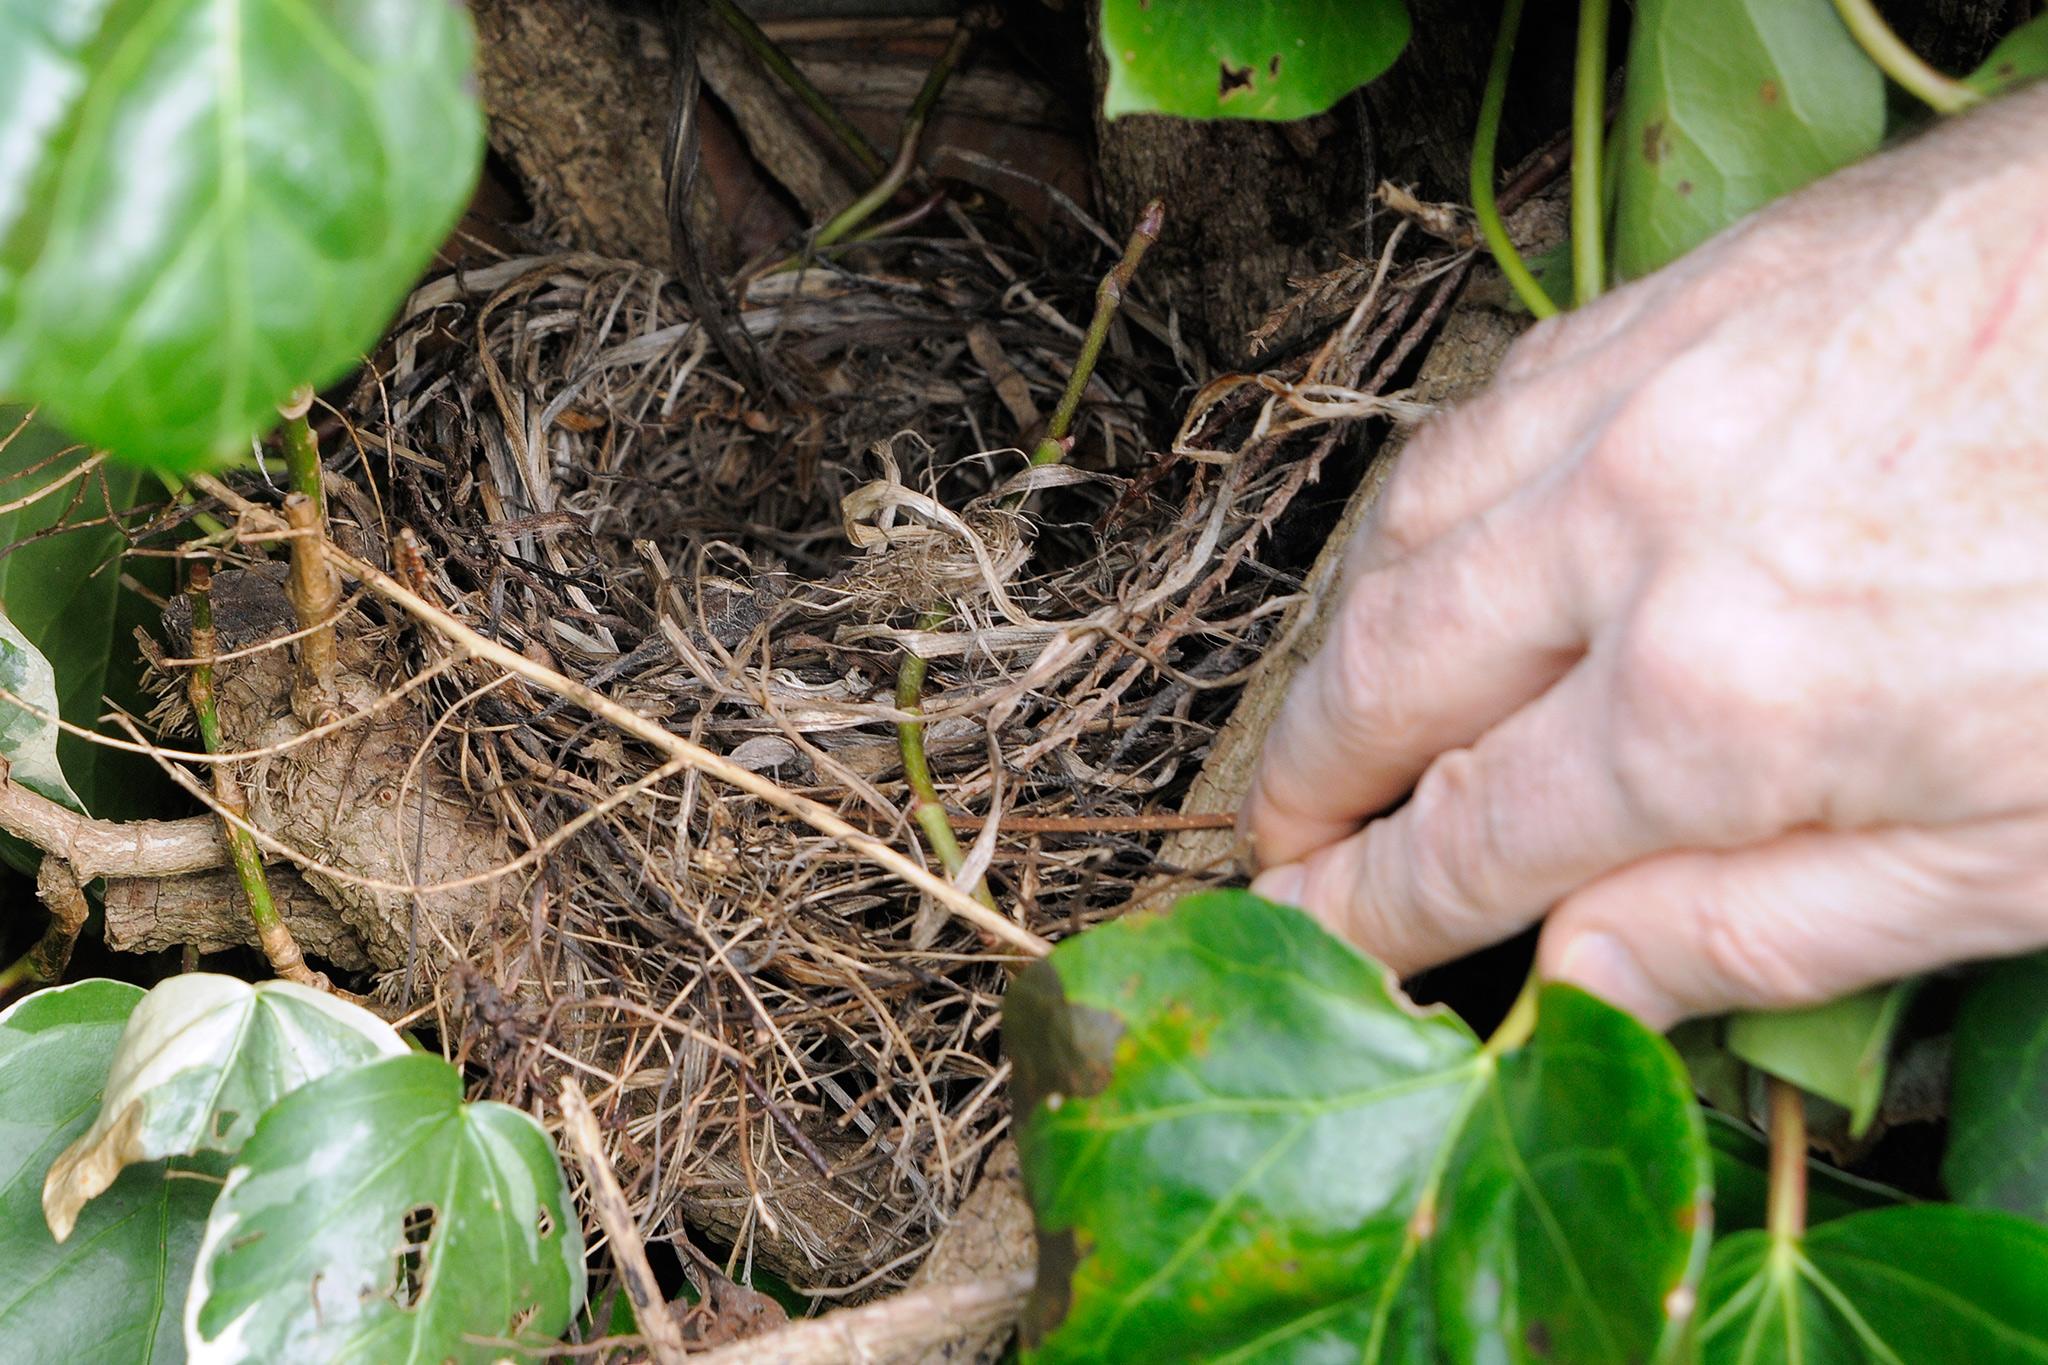 birds-nest-in-hedge-2